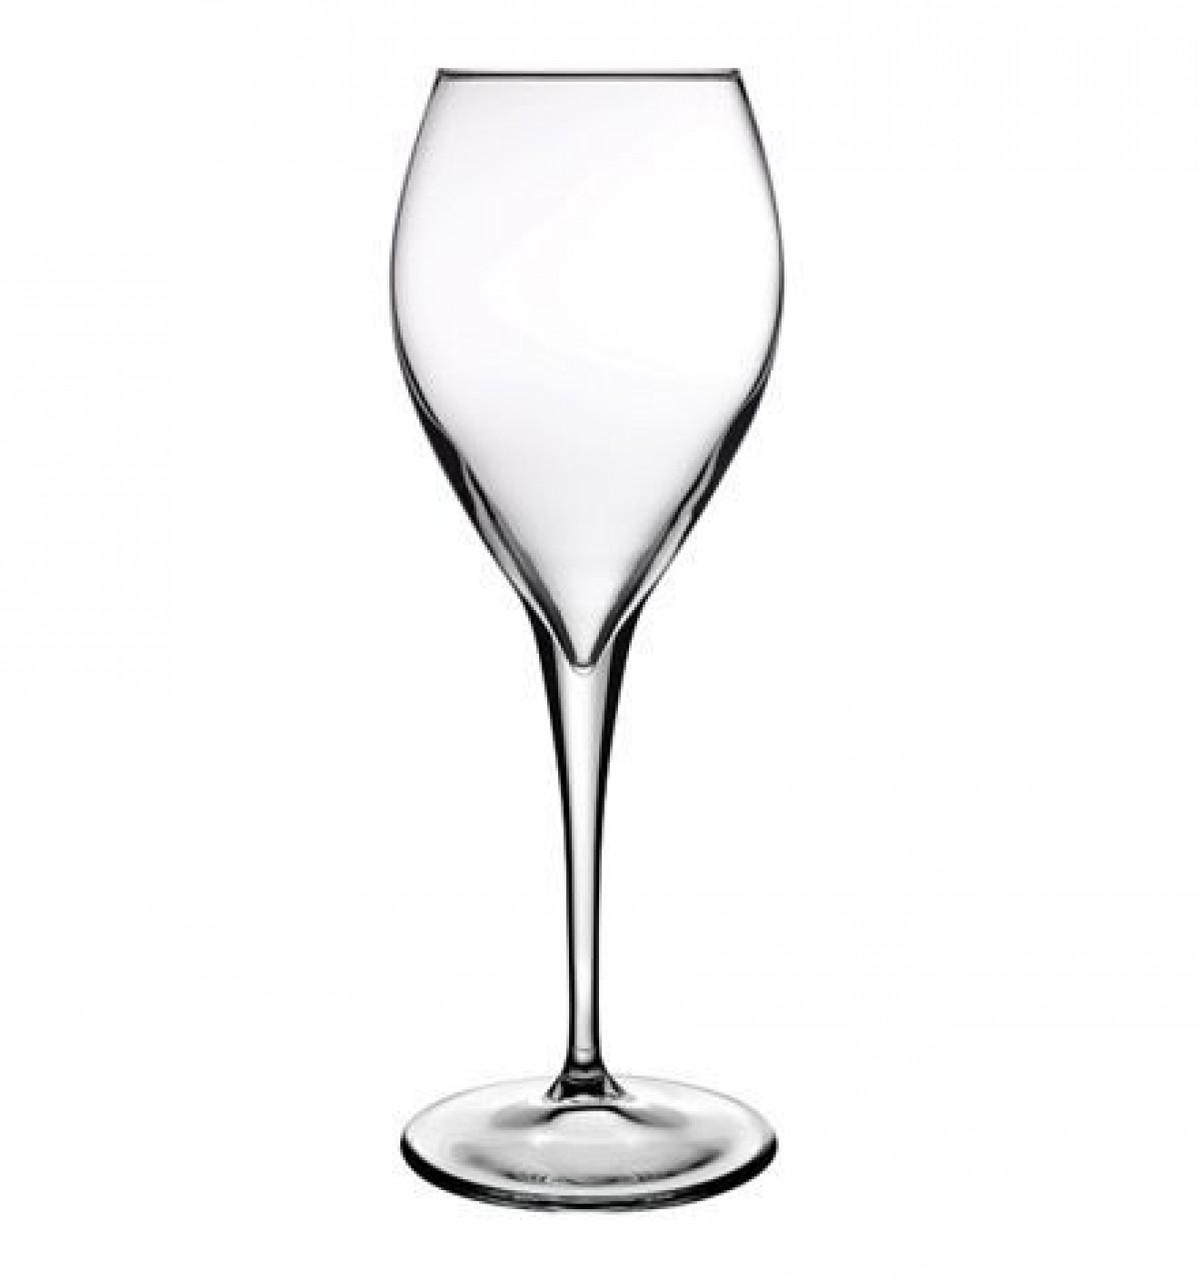 Набор бокалов для вина 445 мл. Монте Карло Pasabahce,6 шт (440088/6)